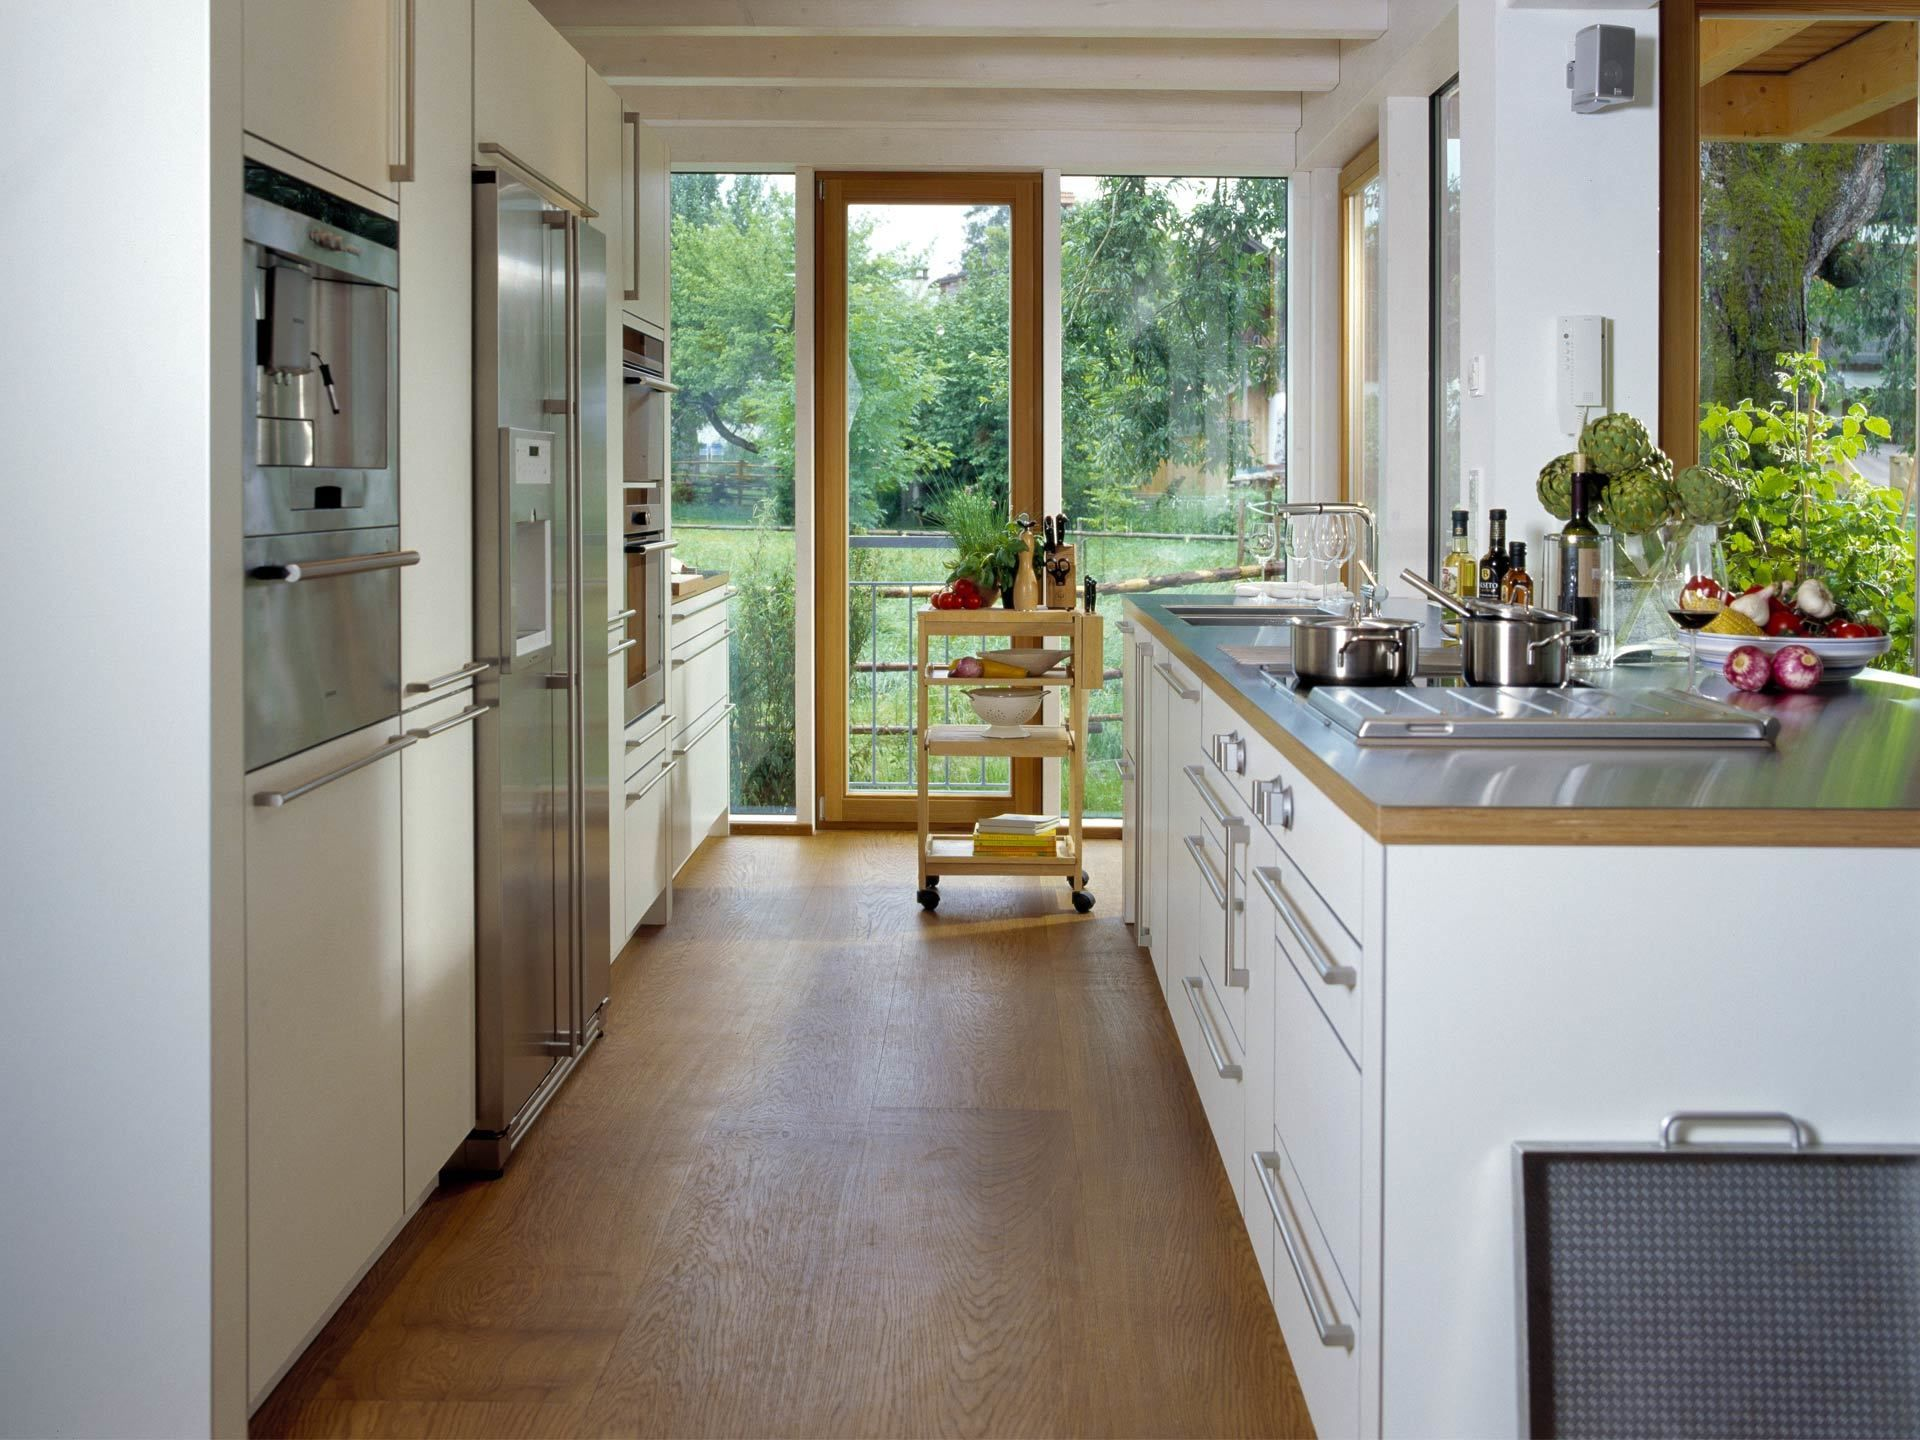 Bauhaus Küchenplatte ~ 44 best küche images on pinterest bauhaus benefits of and